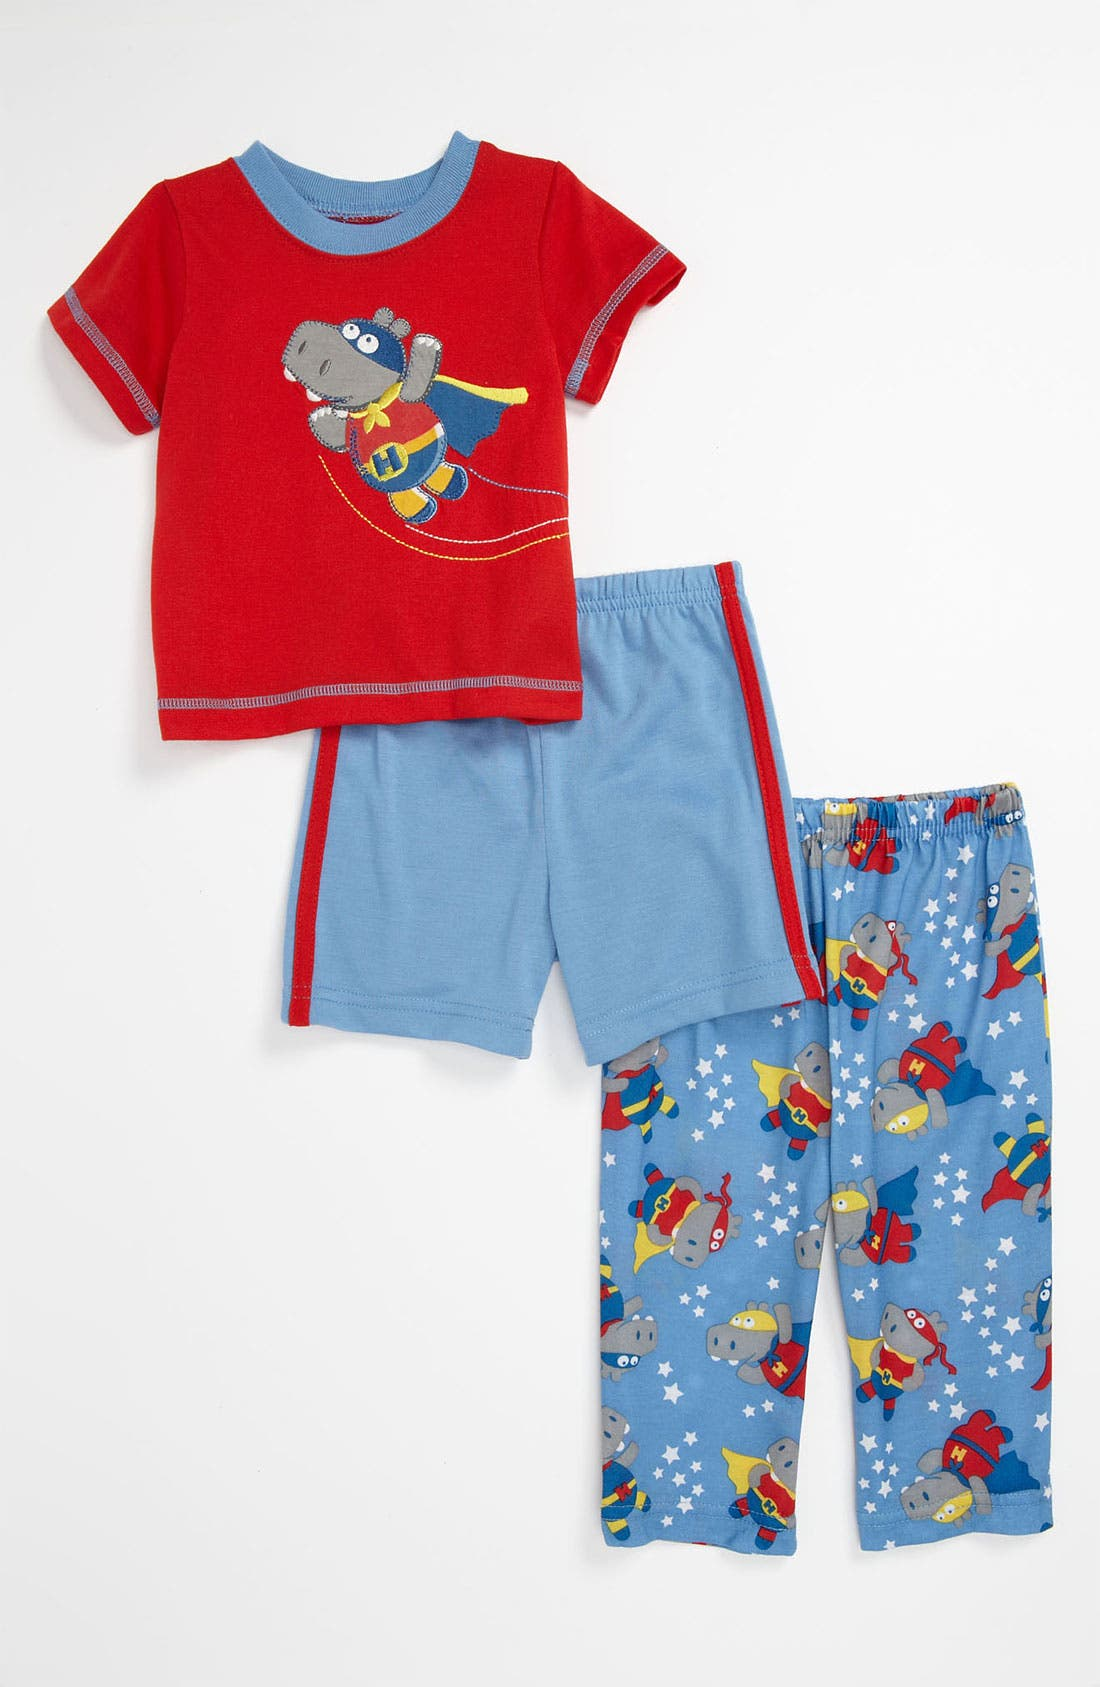 Main Image - Little Me 'Hippo' Sleepwear Set (Infant)